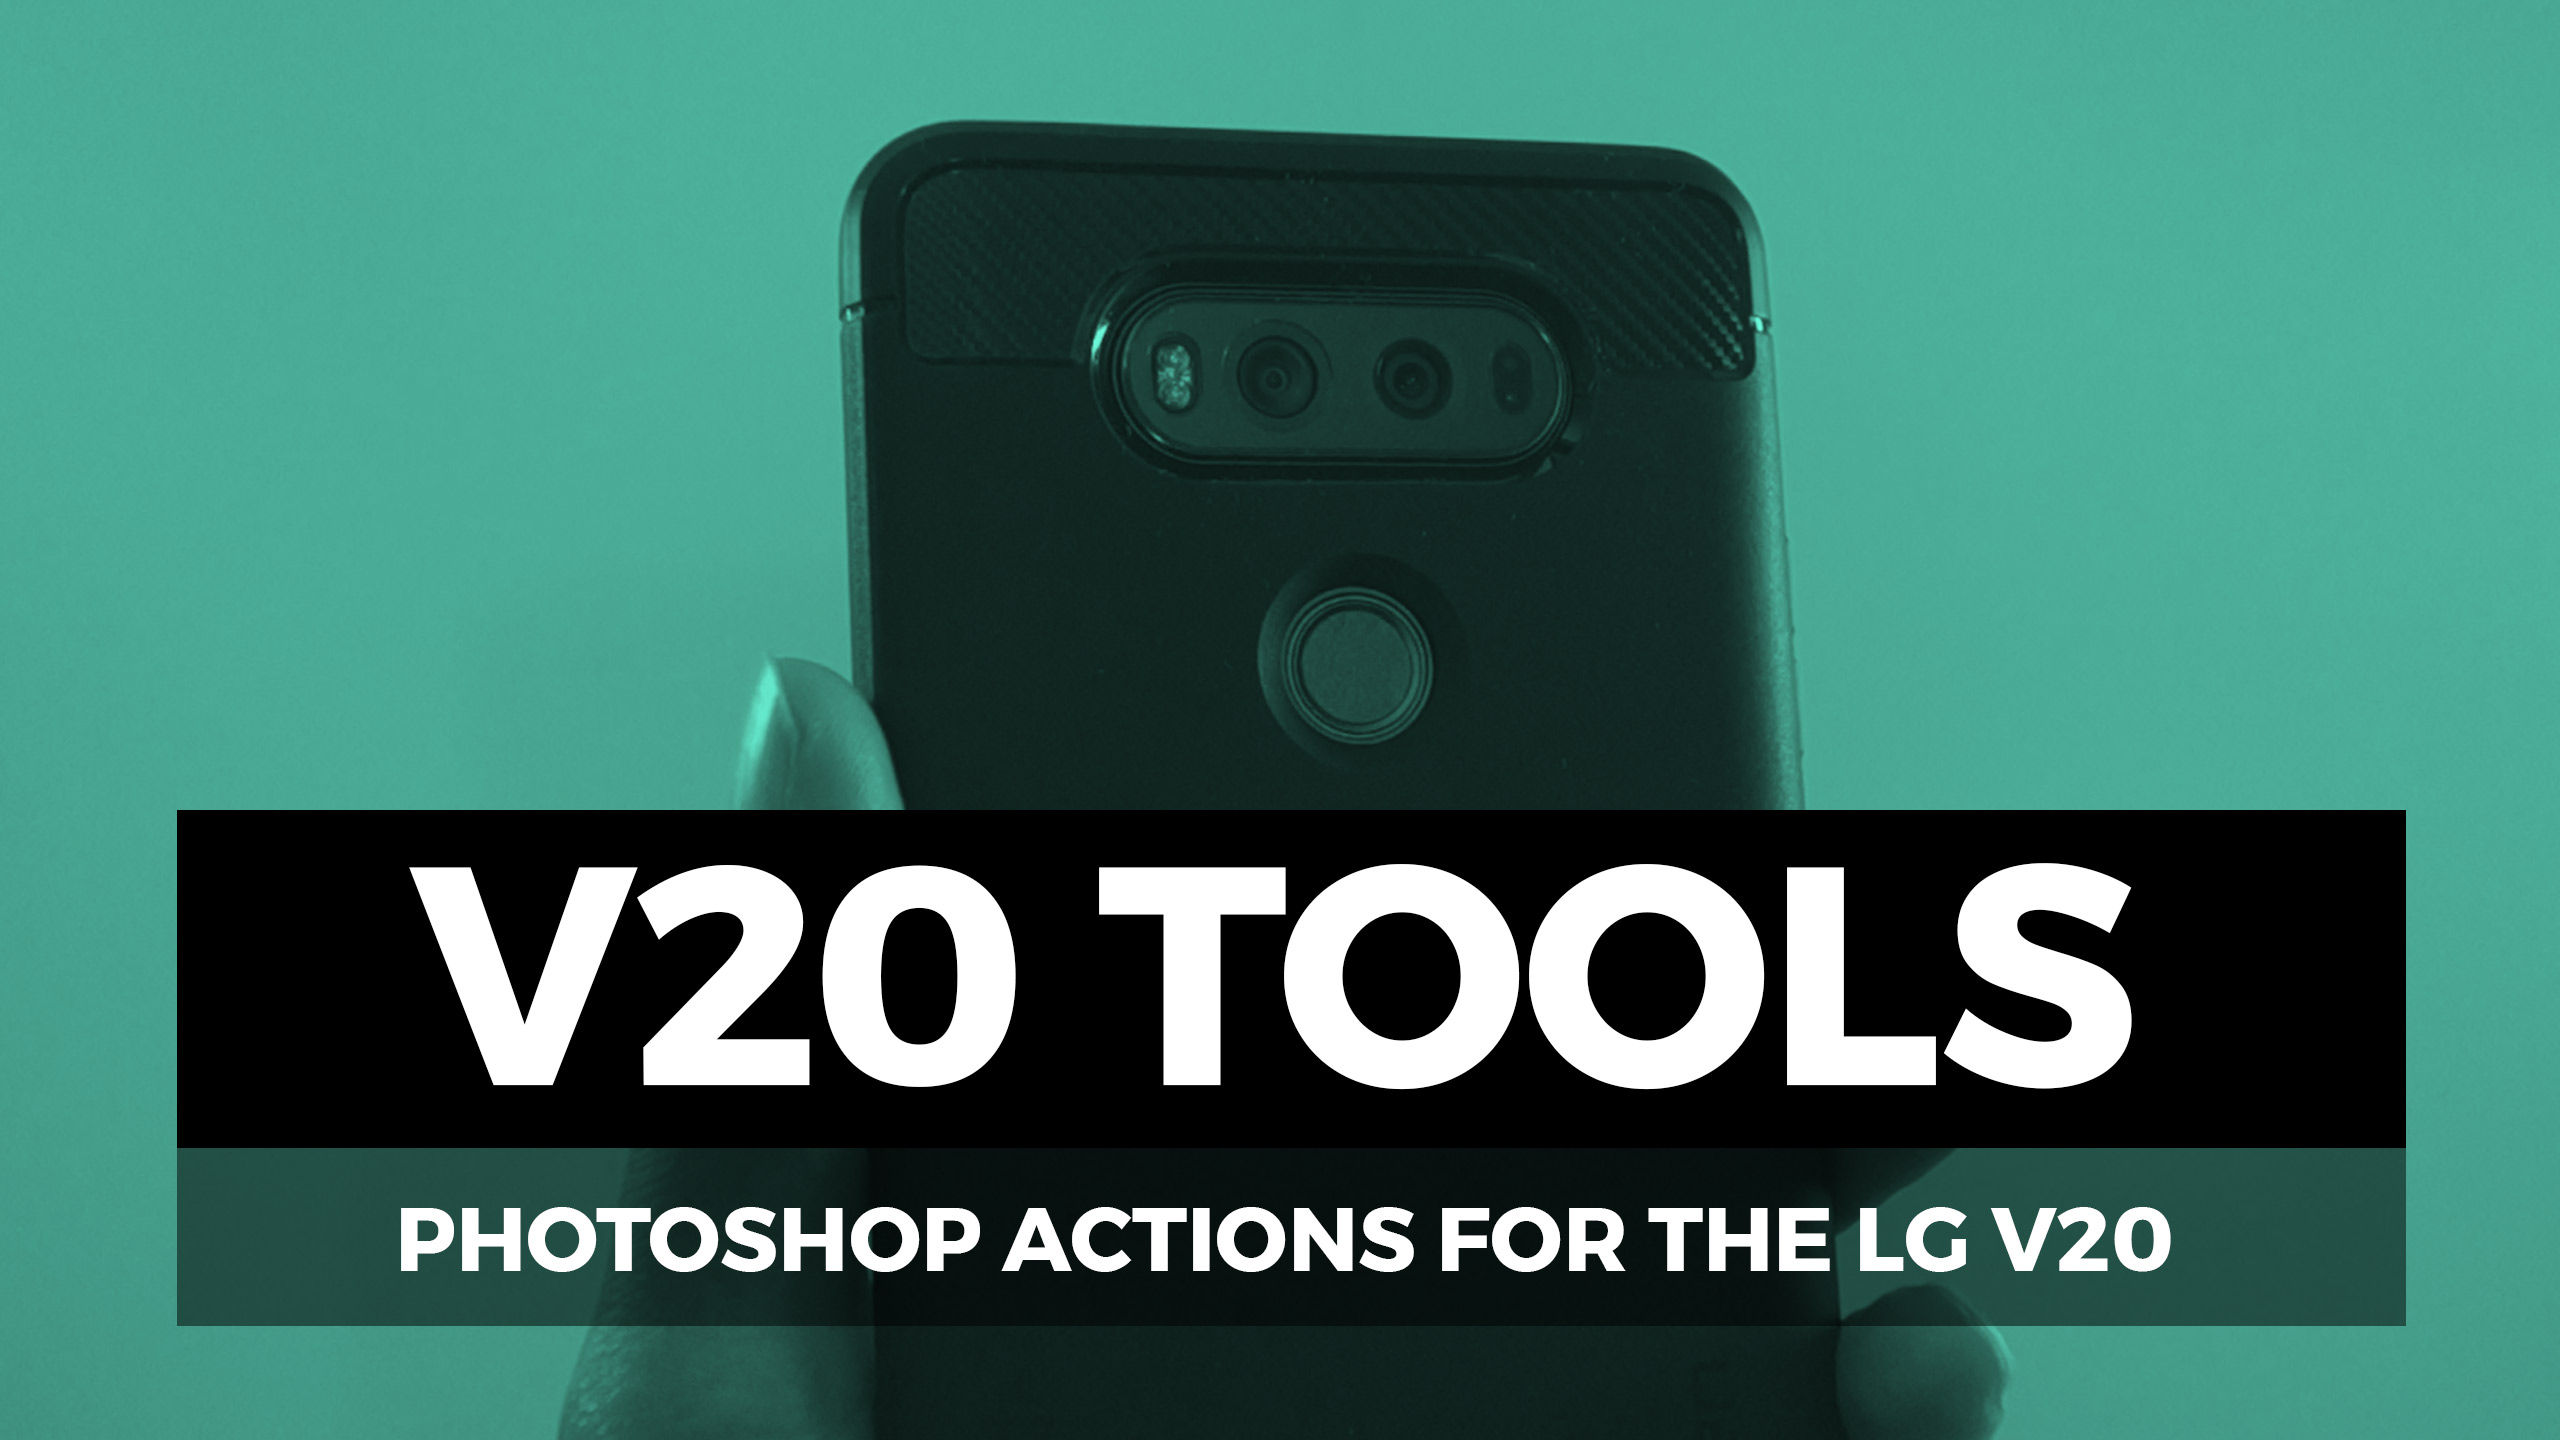 LG V20 Tools